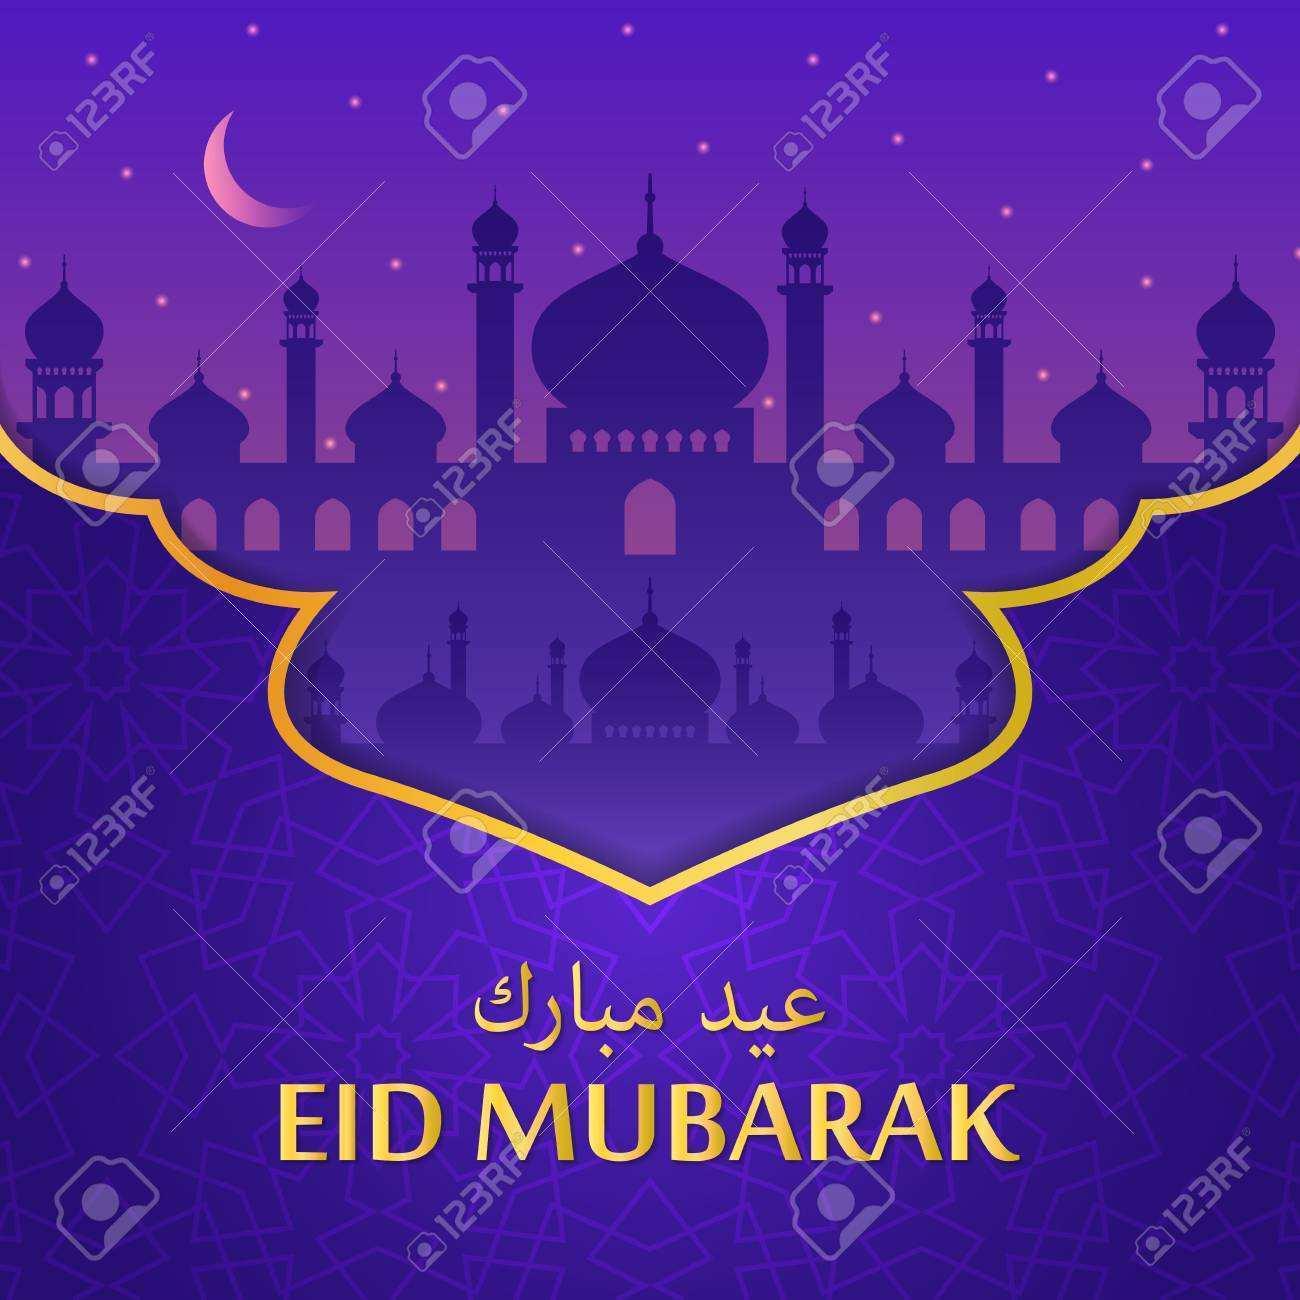 5 The Best Eid Mubarak Card Templates Maker for Eid Mubarak Card